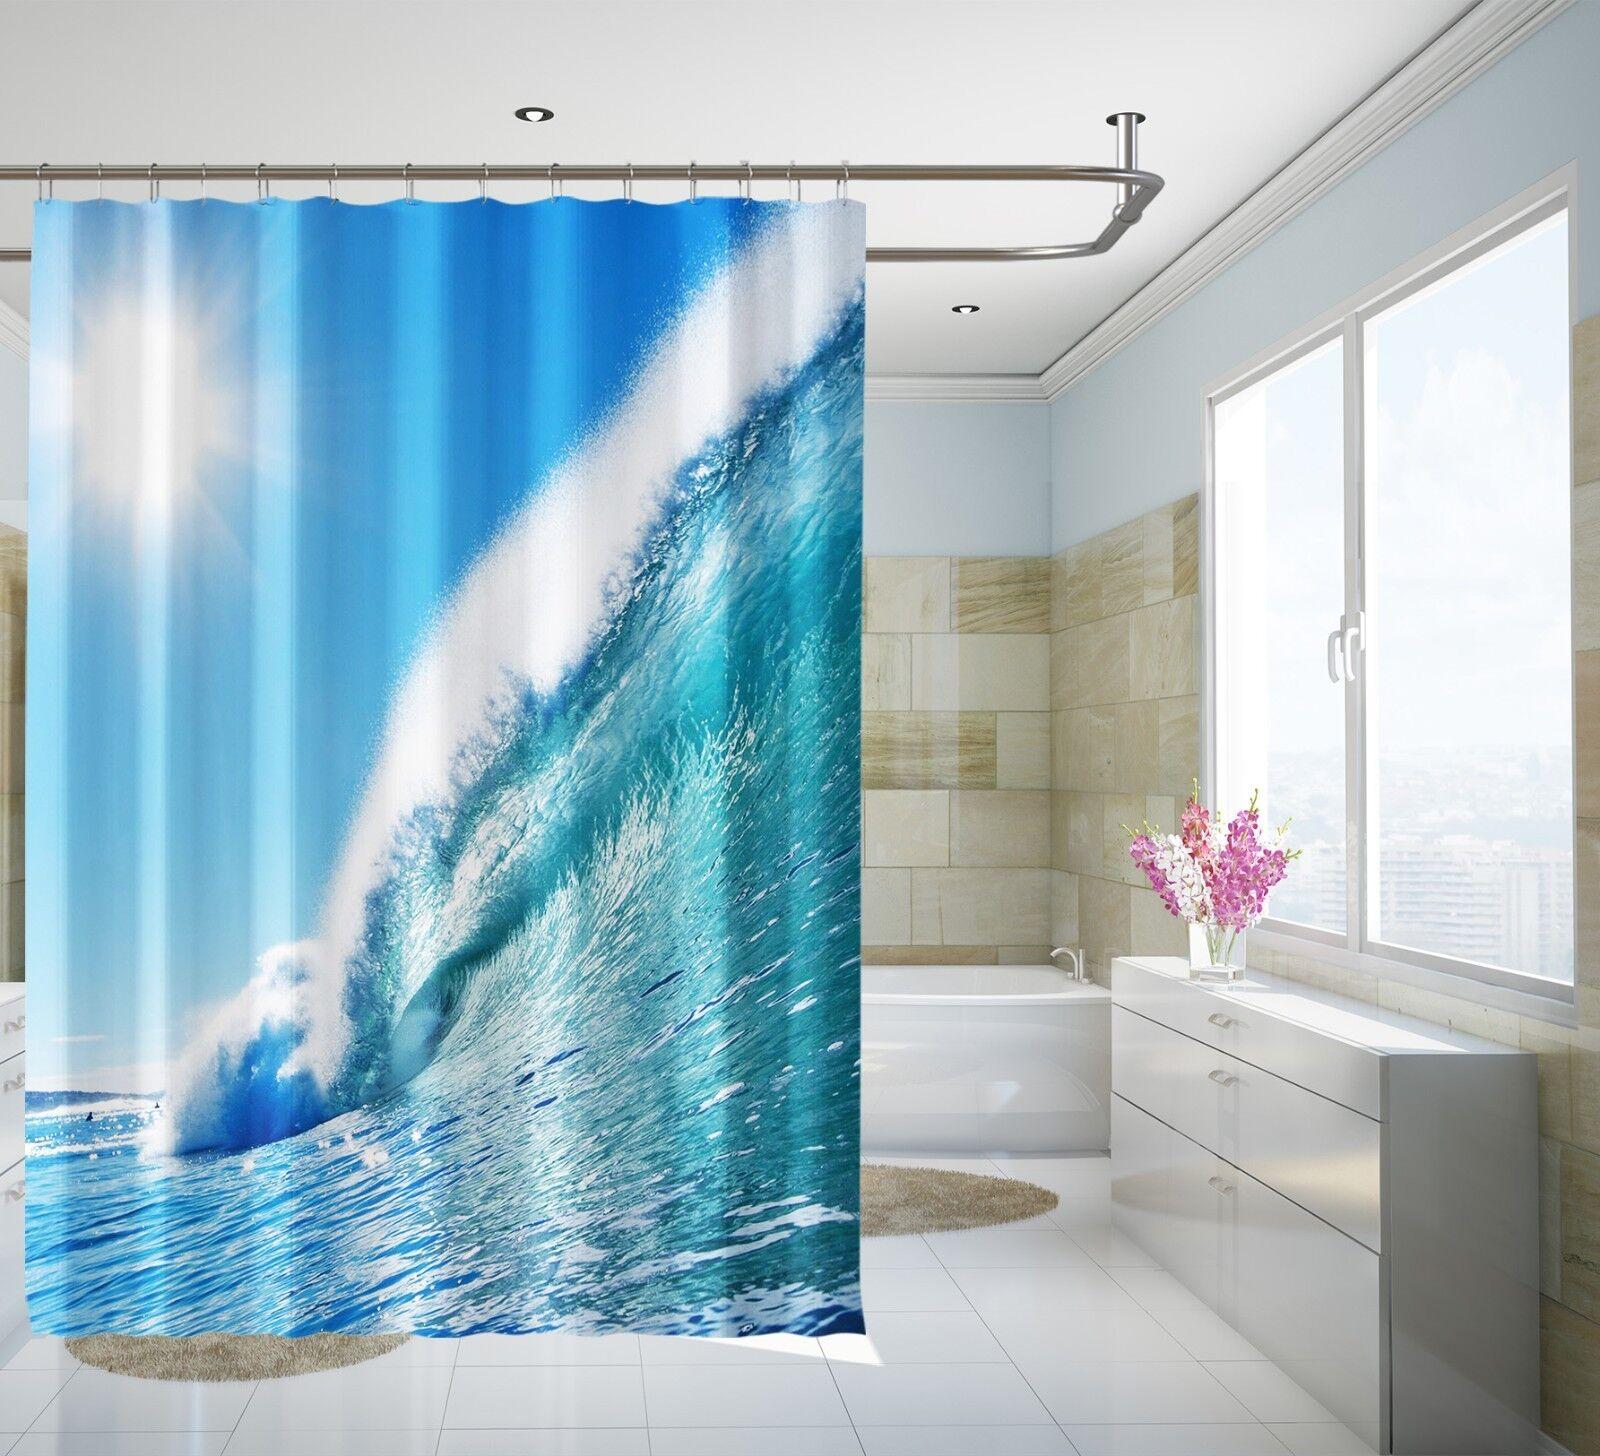 3D WAVE Sunshine 23 Tenda da doccia IMPERMEABILE Fibra Bagno WC CASA FINESTRE